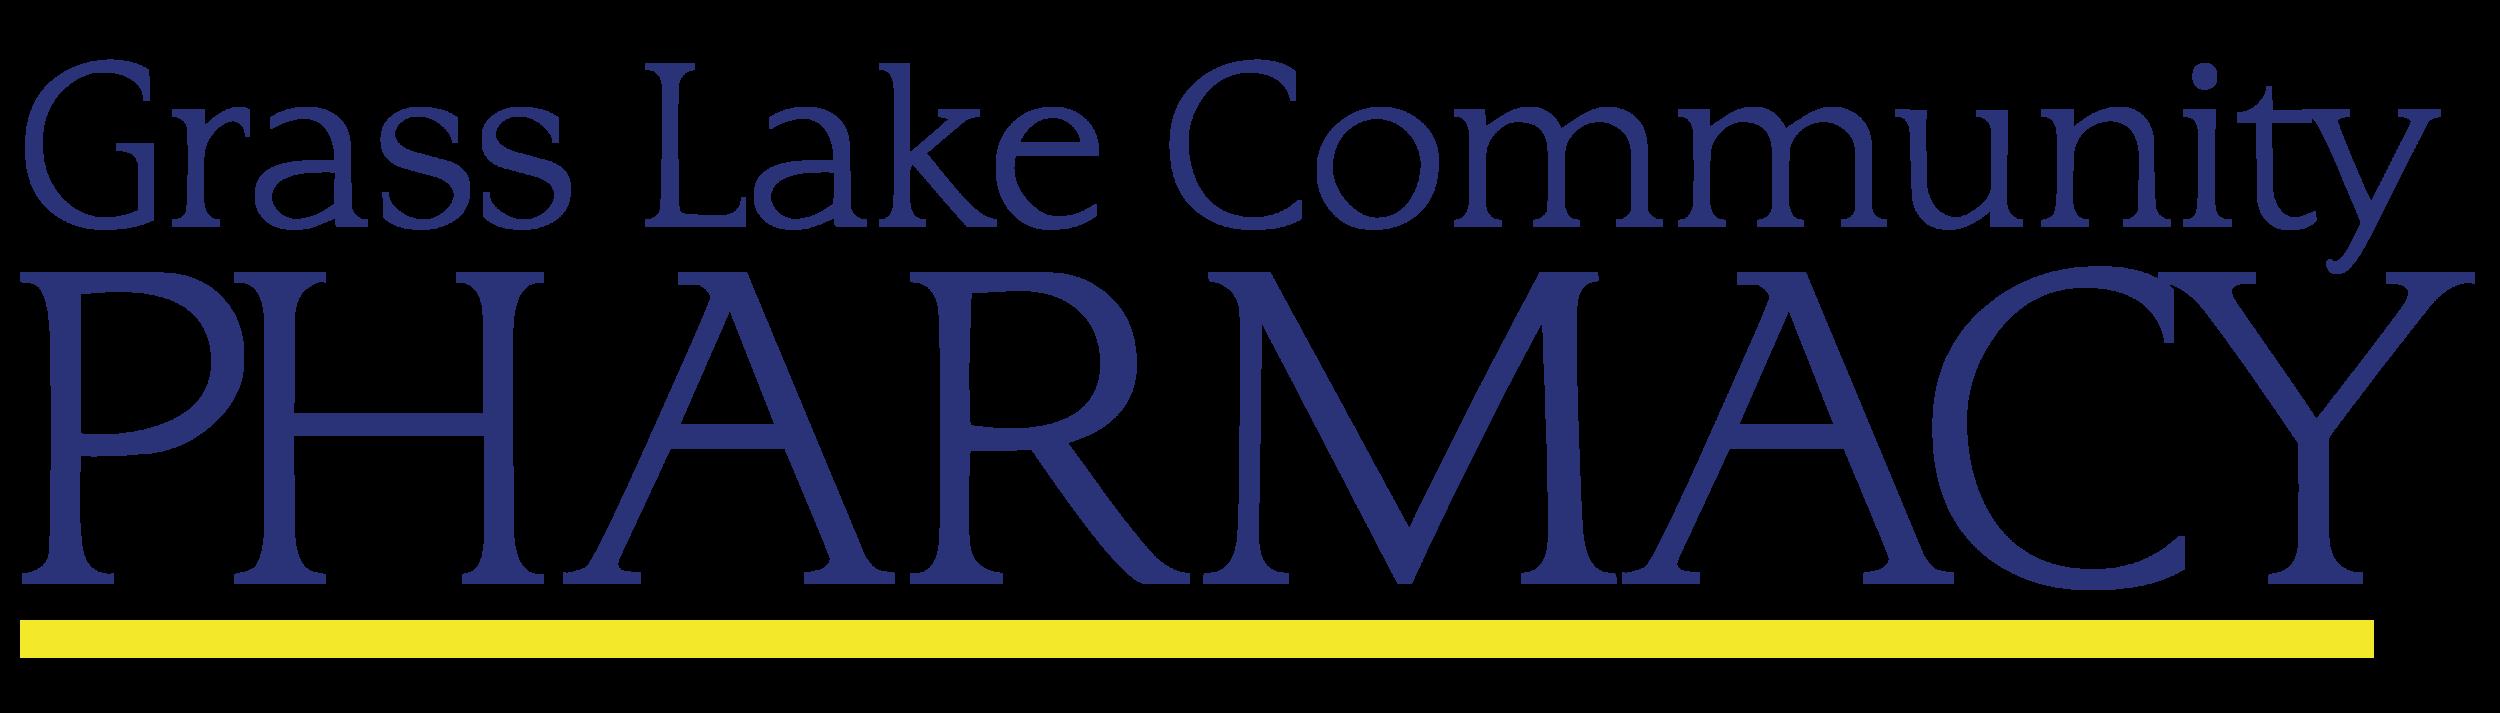 Grass-Lake-Community-Pharmacy-Logo.png